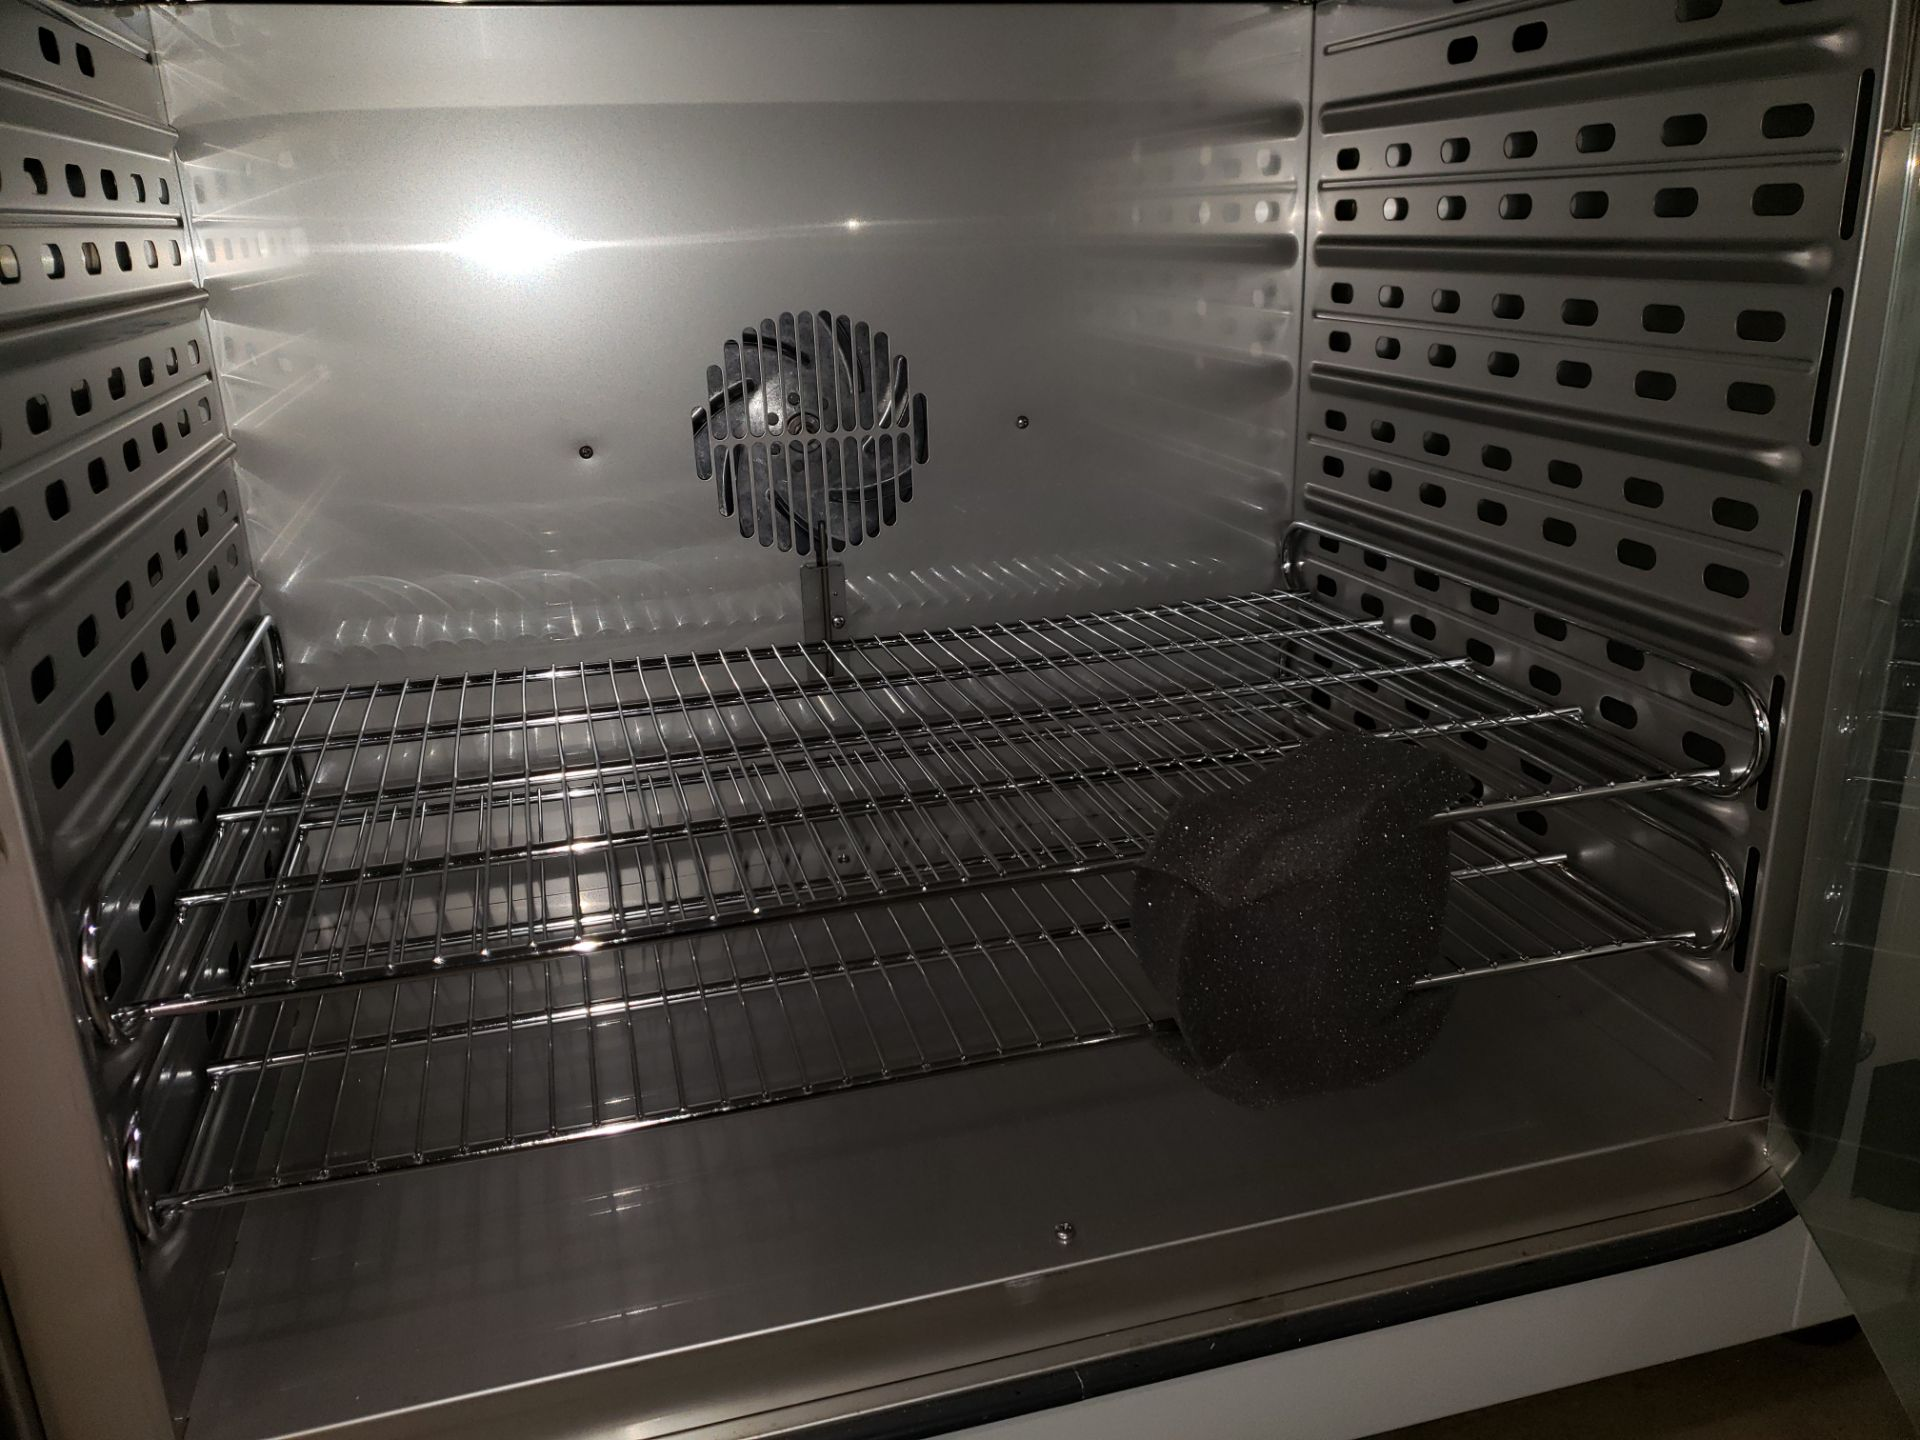 Lot 29 - Unused Binder incubator, model BF 115-UL, 4.1 cu ft capacity, .4 kw, 115 volt heater,